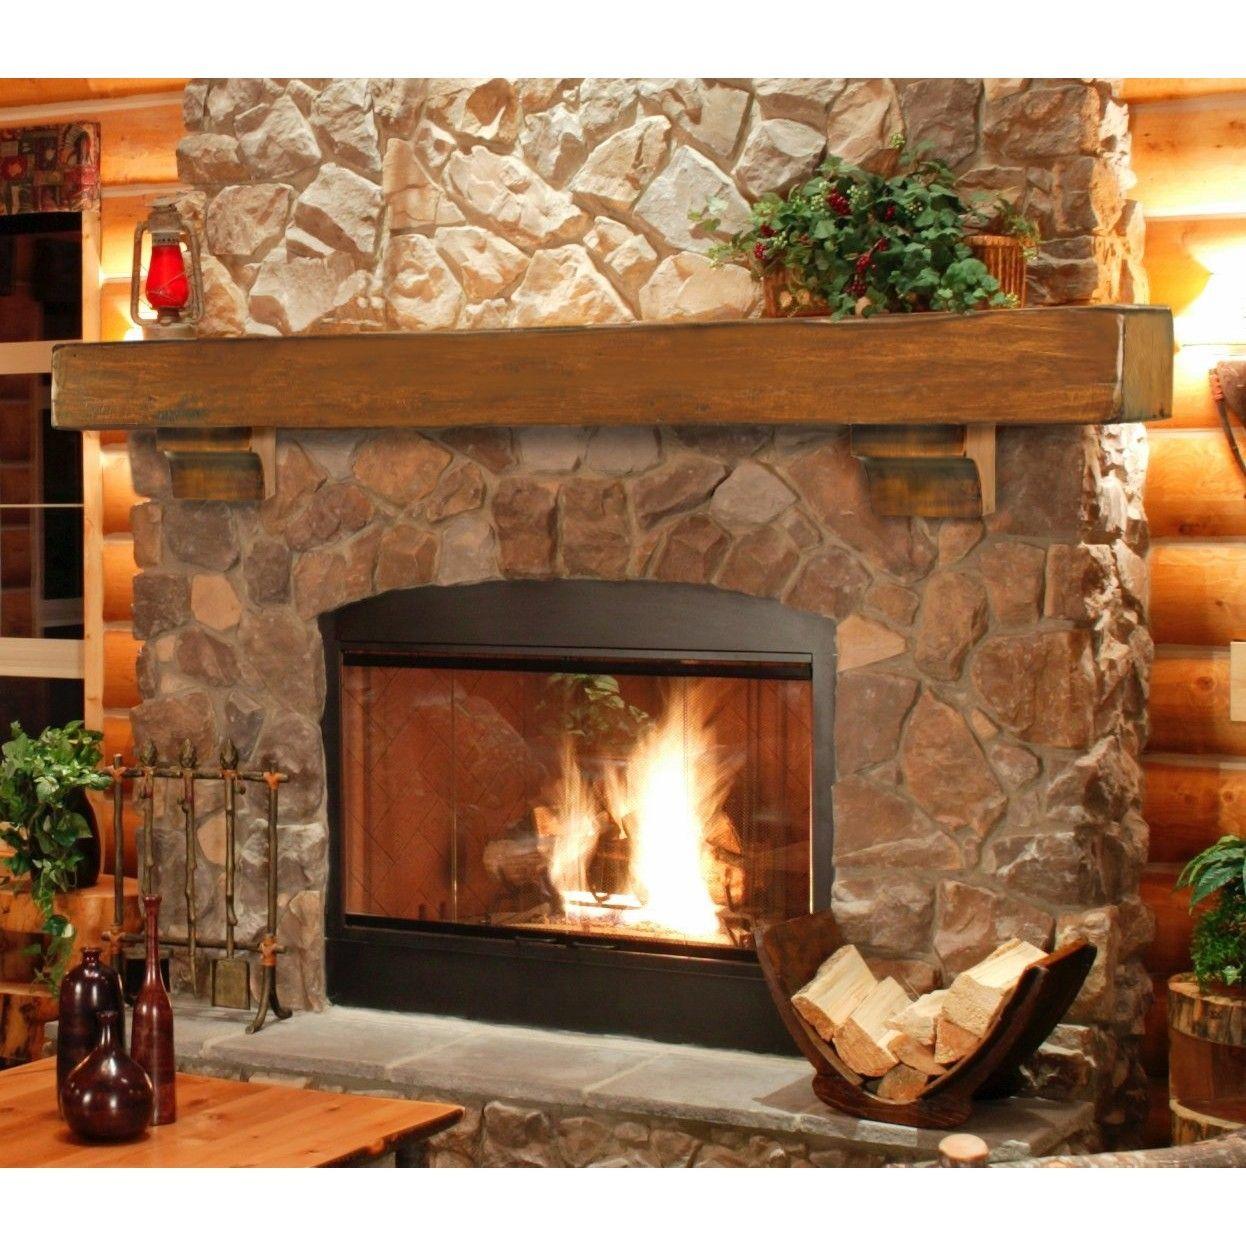 install propane fireplace mantel kits http junklog com install